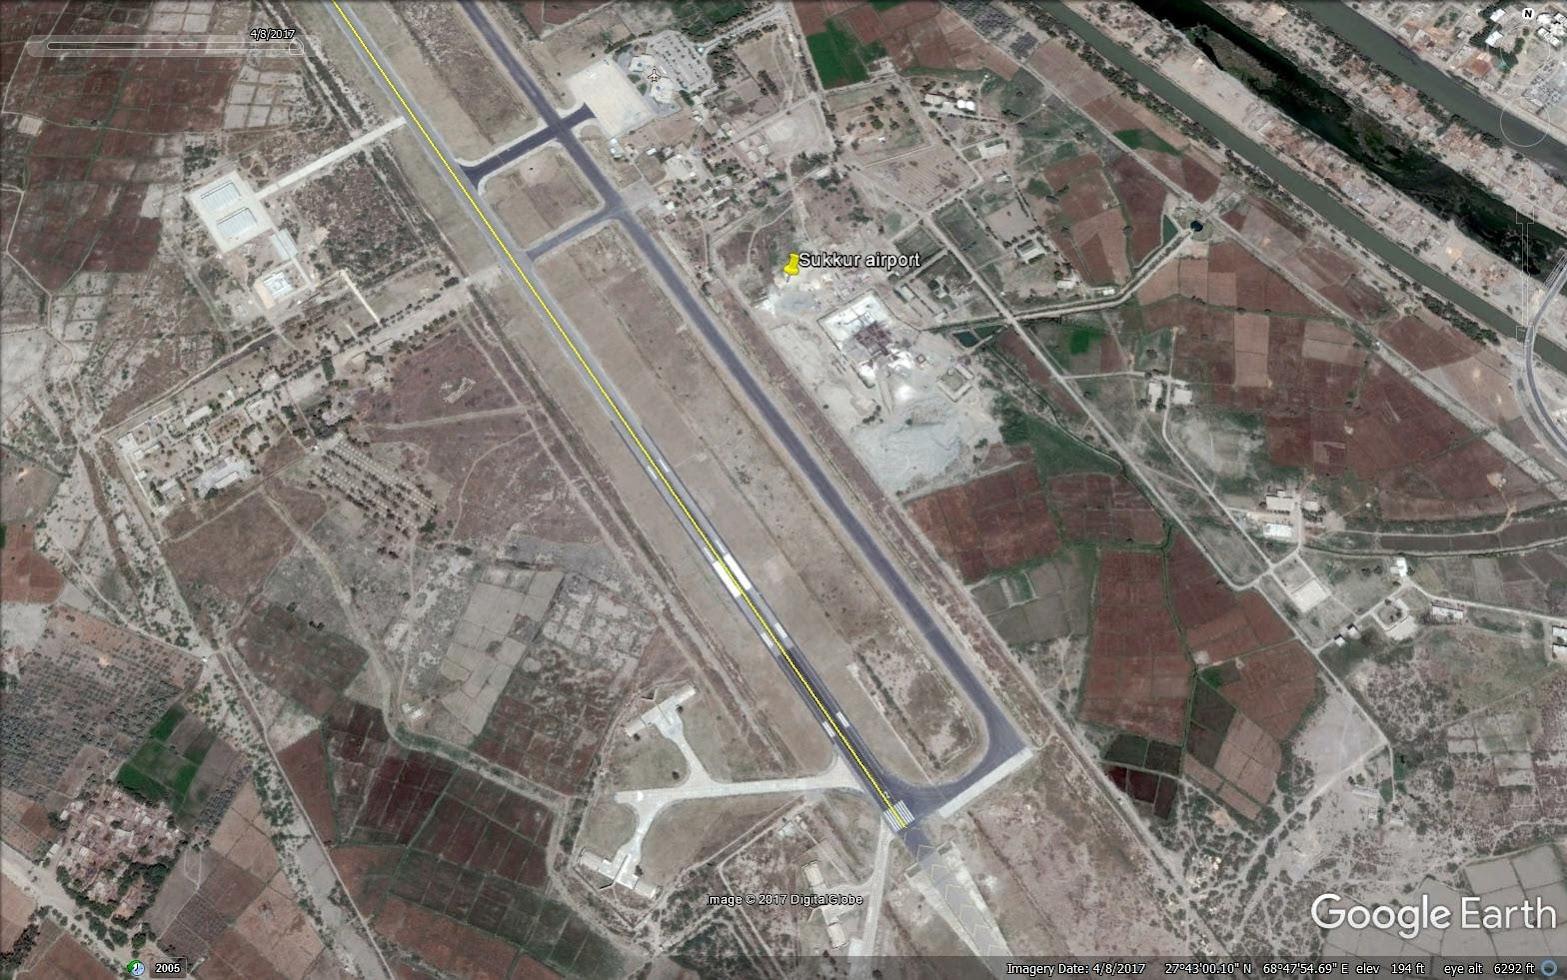 Sukkur airstrip 2.76km